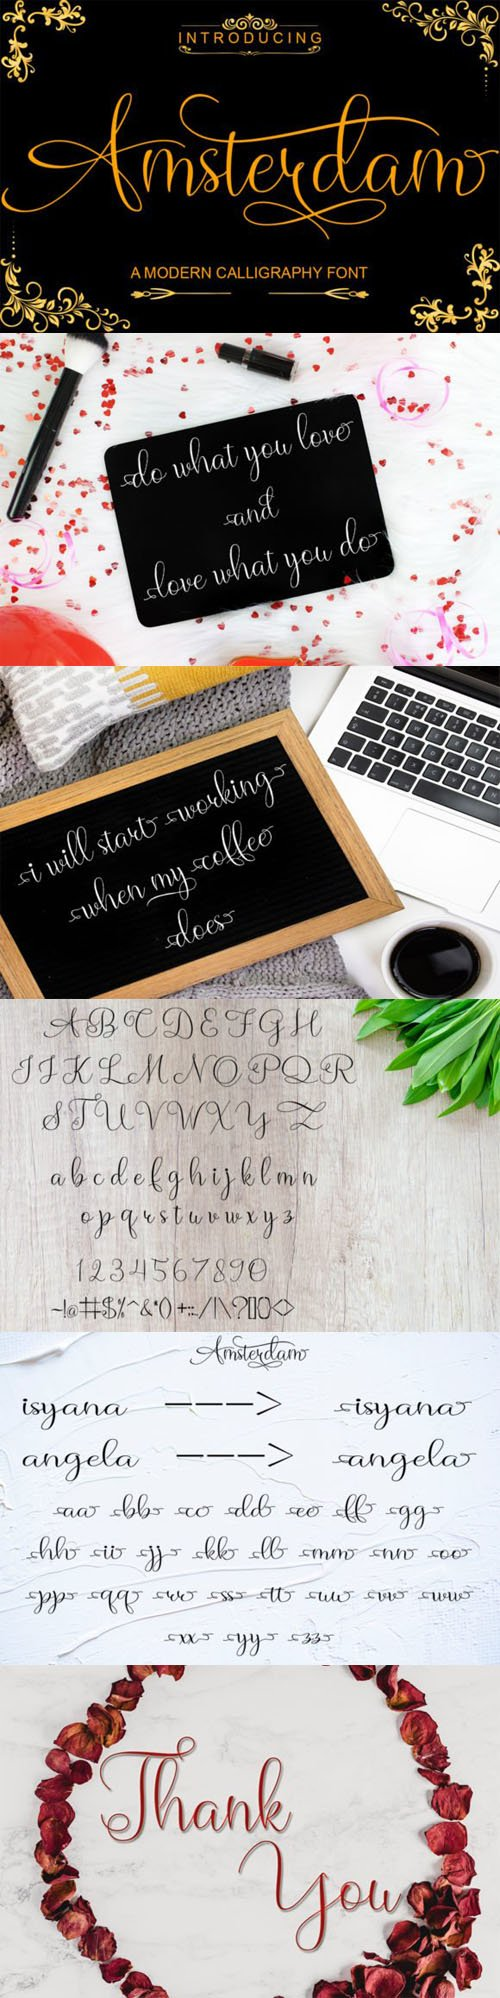 Amsterdam - Modern Calligraphy Font